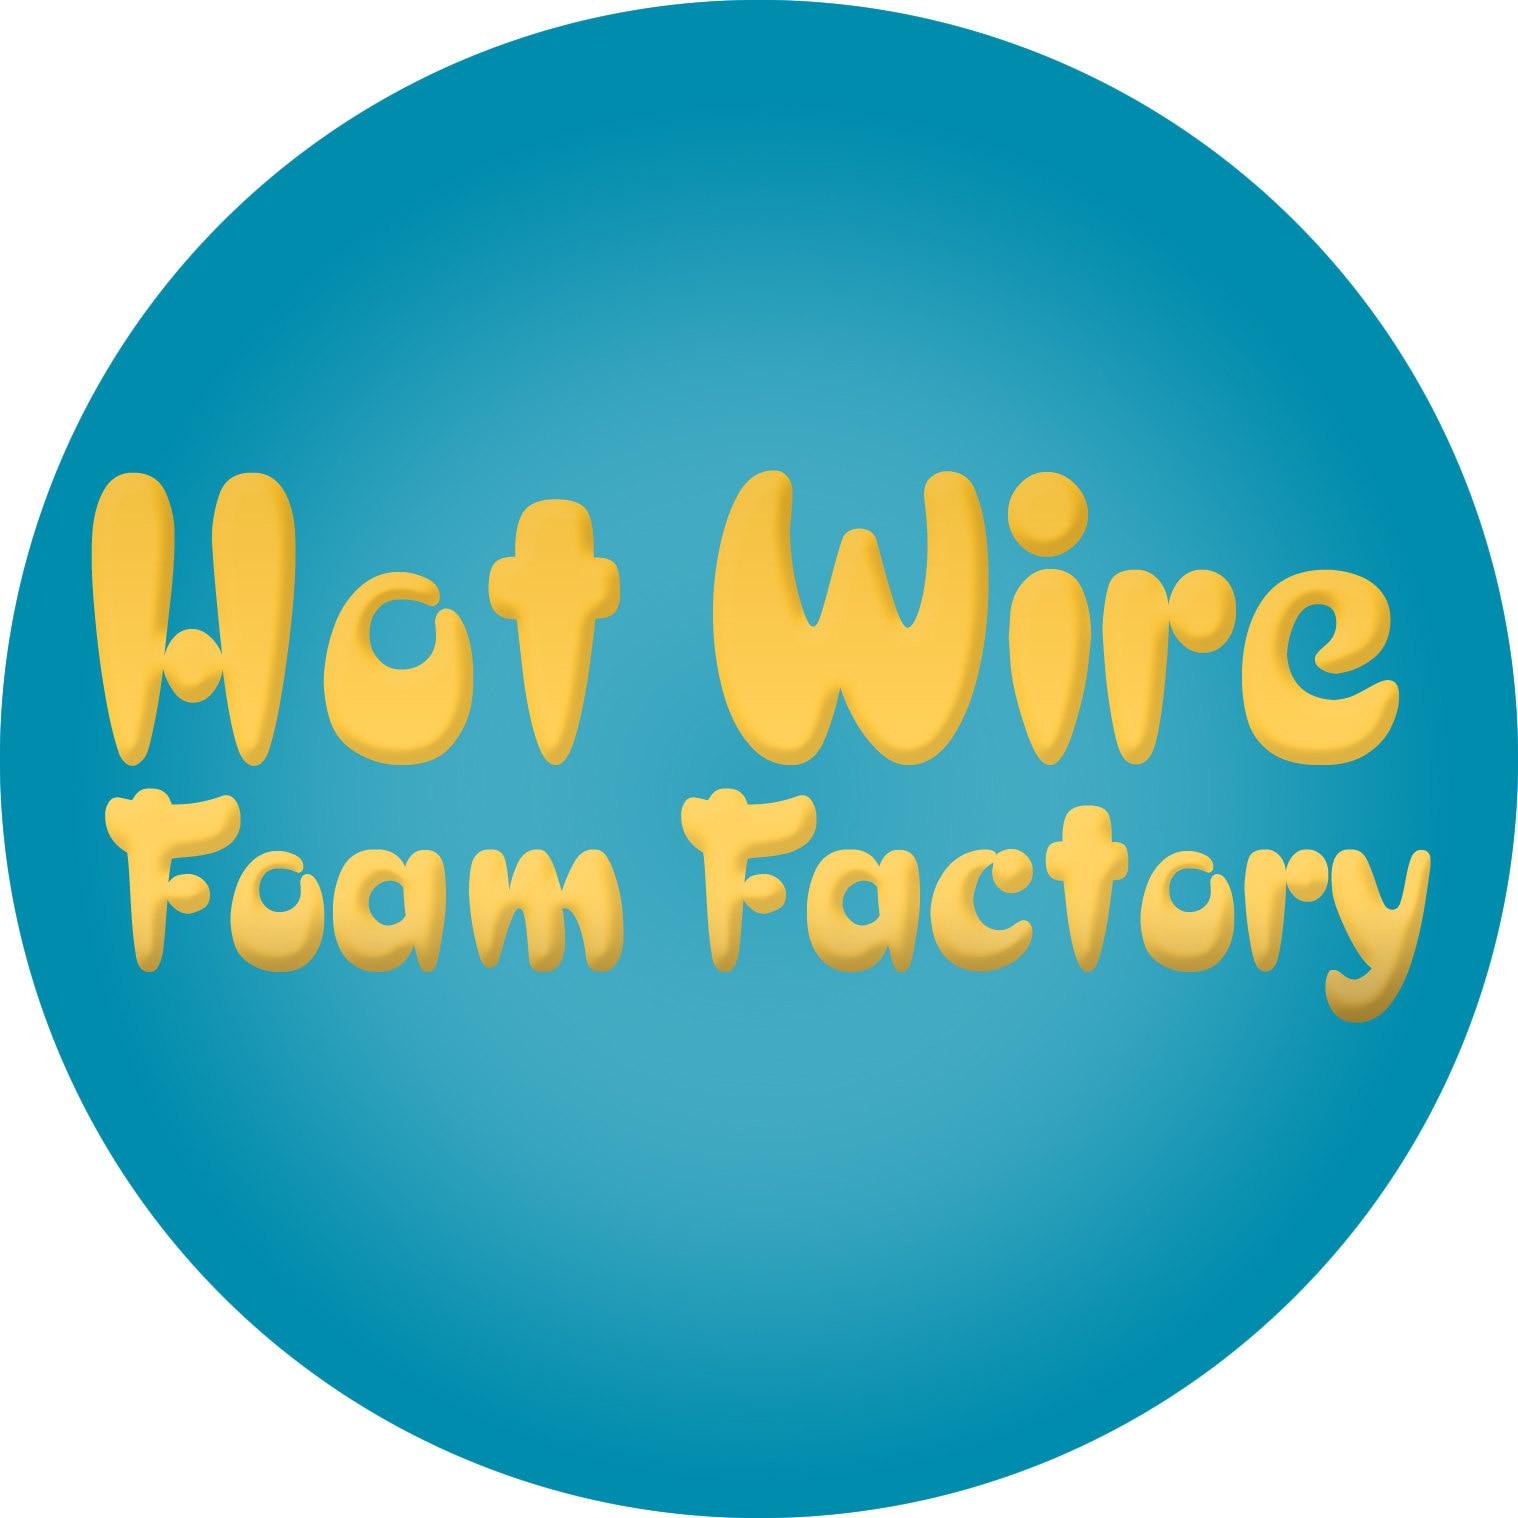 Hot Wire Foam Cutters & Sculpting Tools by HotWireFoamFactory